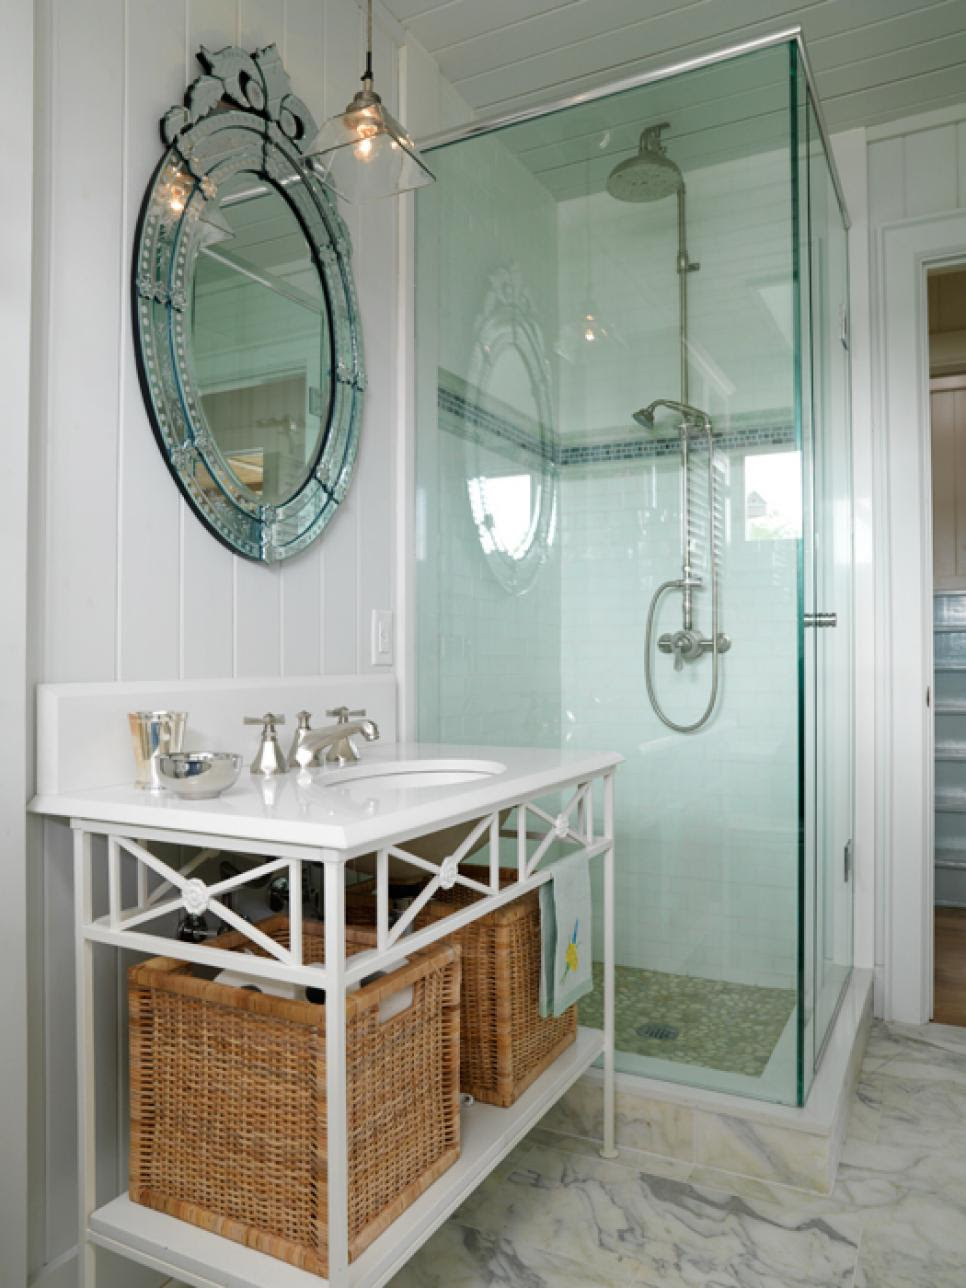 12 Clever Bathroom Storage Ideas | HGTV